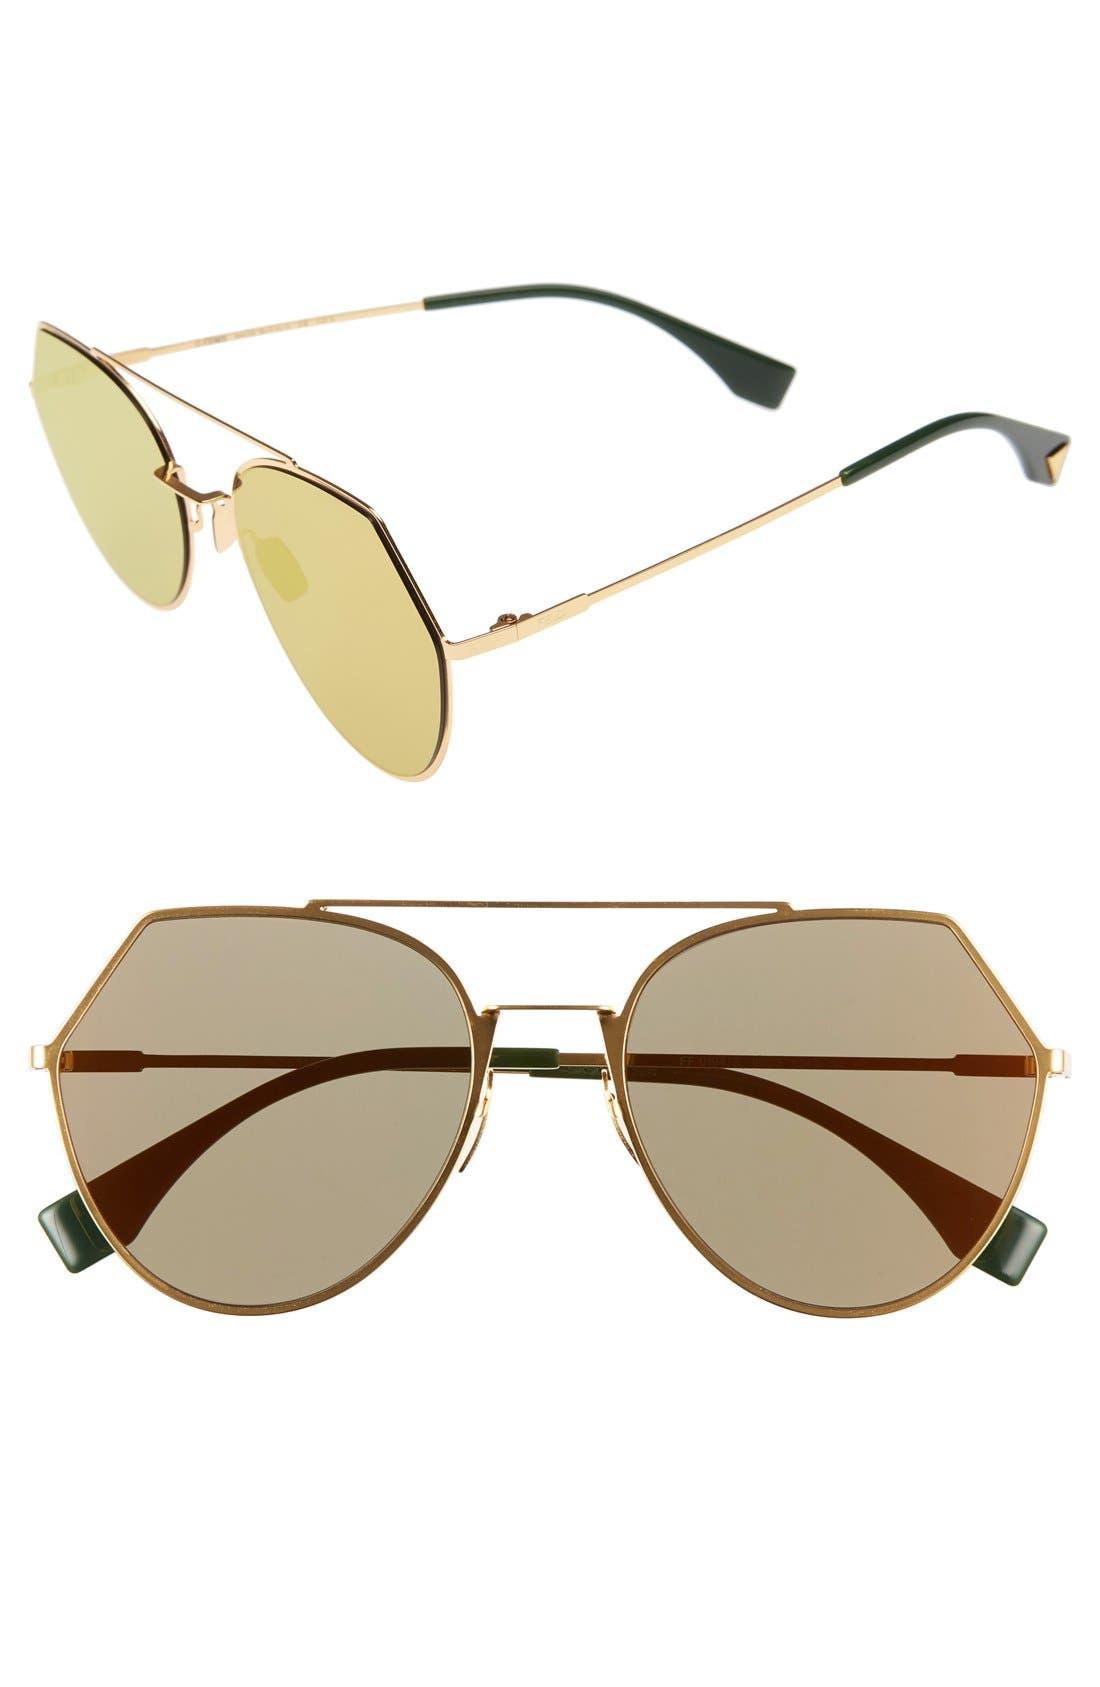 Alternate Image 1 Selected - Fendi Eyeline 55mm Sunglasses